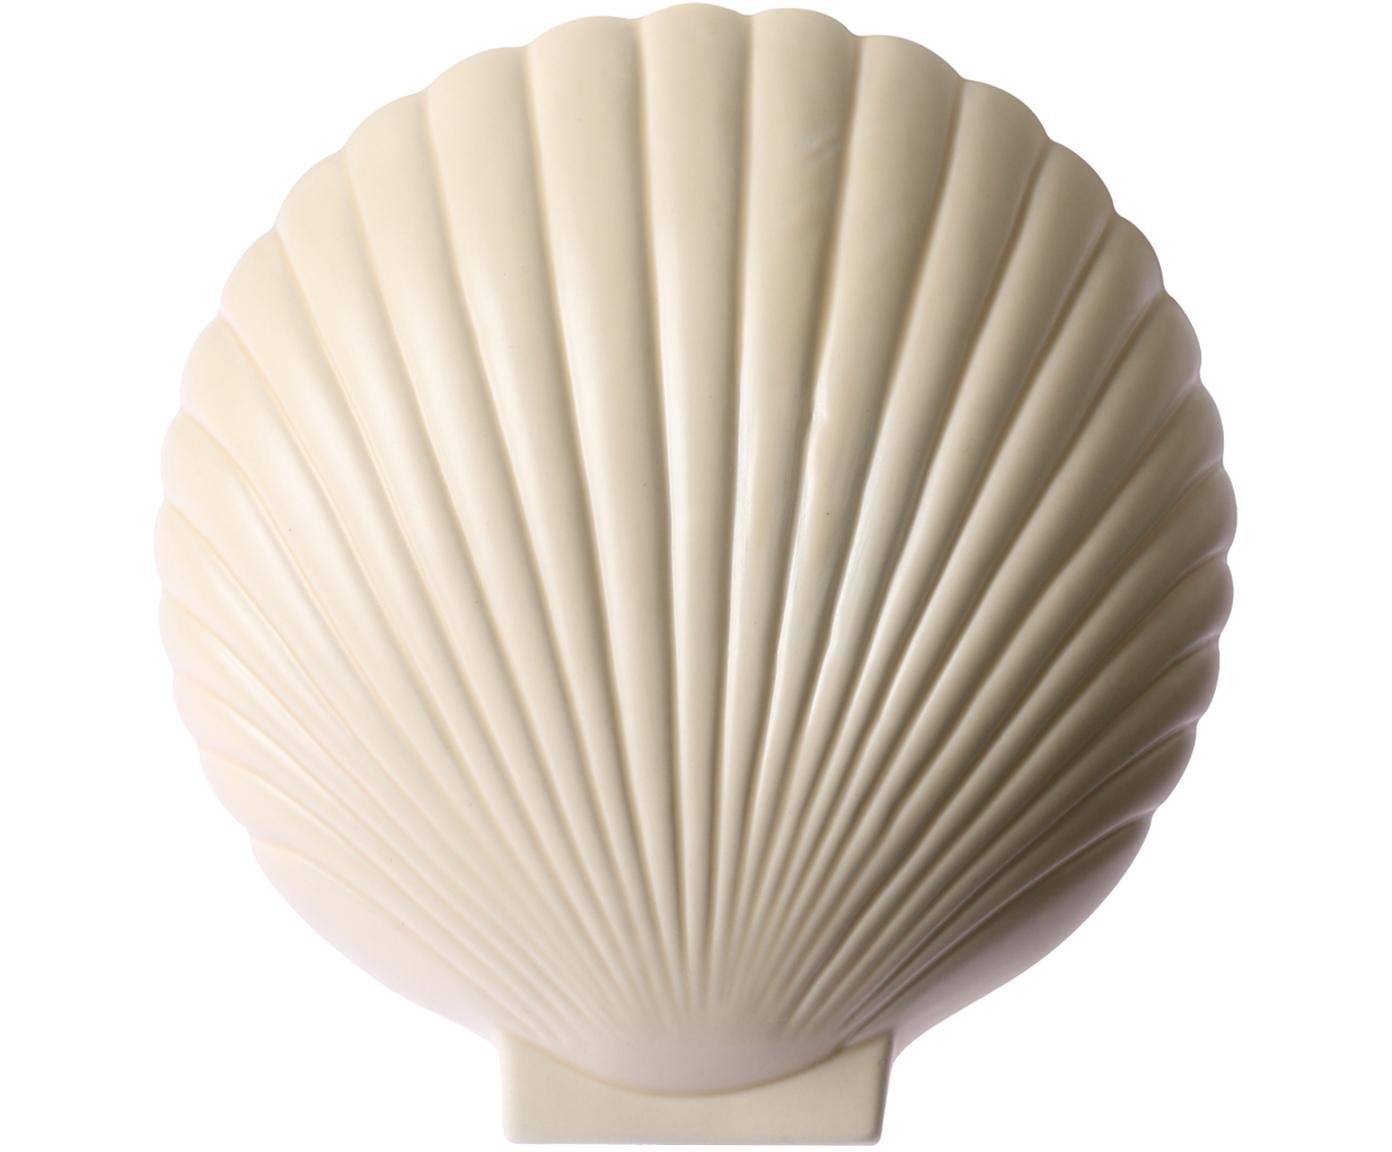 Applique con spina Shell, Terracotta, Giallo pastello, Larg. 19 x Alt. 21 cm